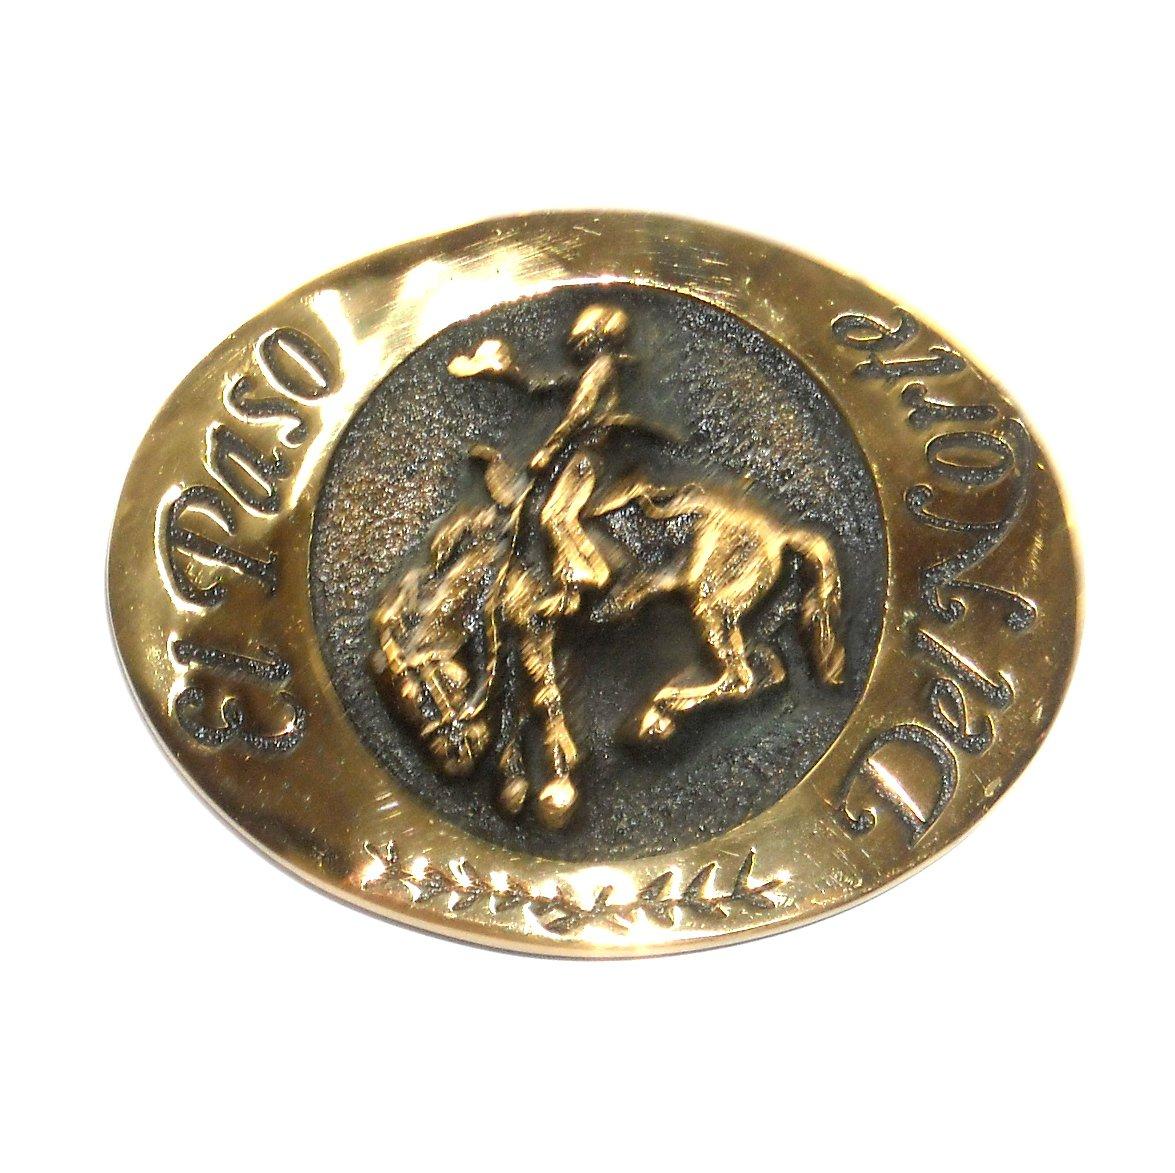 Saddle Bronc Riding El Paso Del Norte State National Heritage Mint Brass Belt Buckle